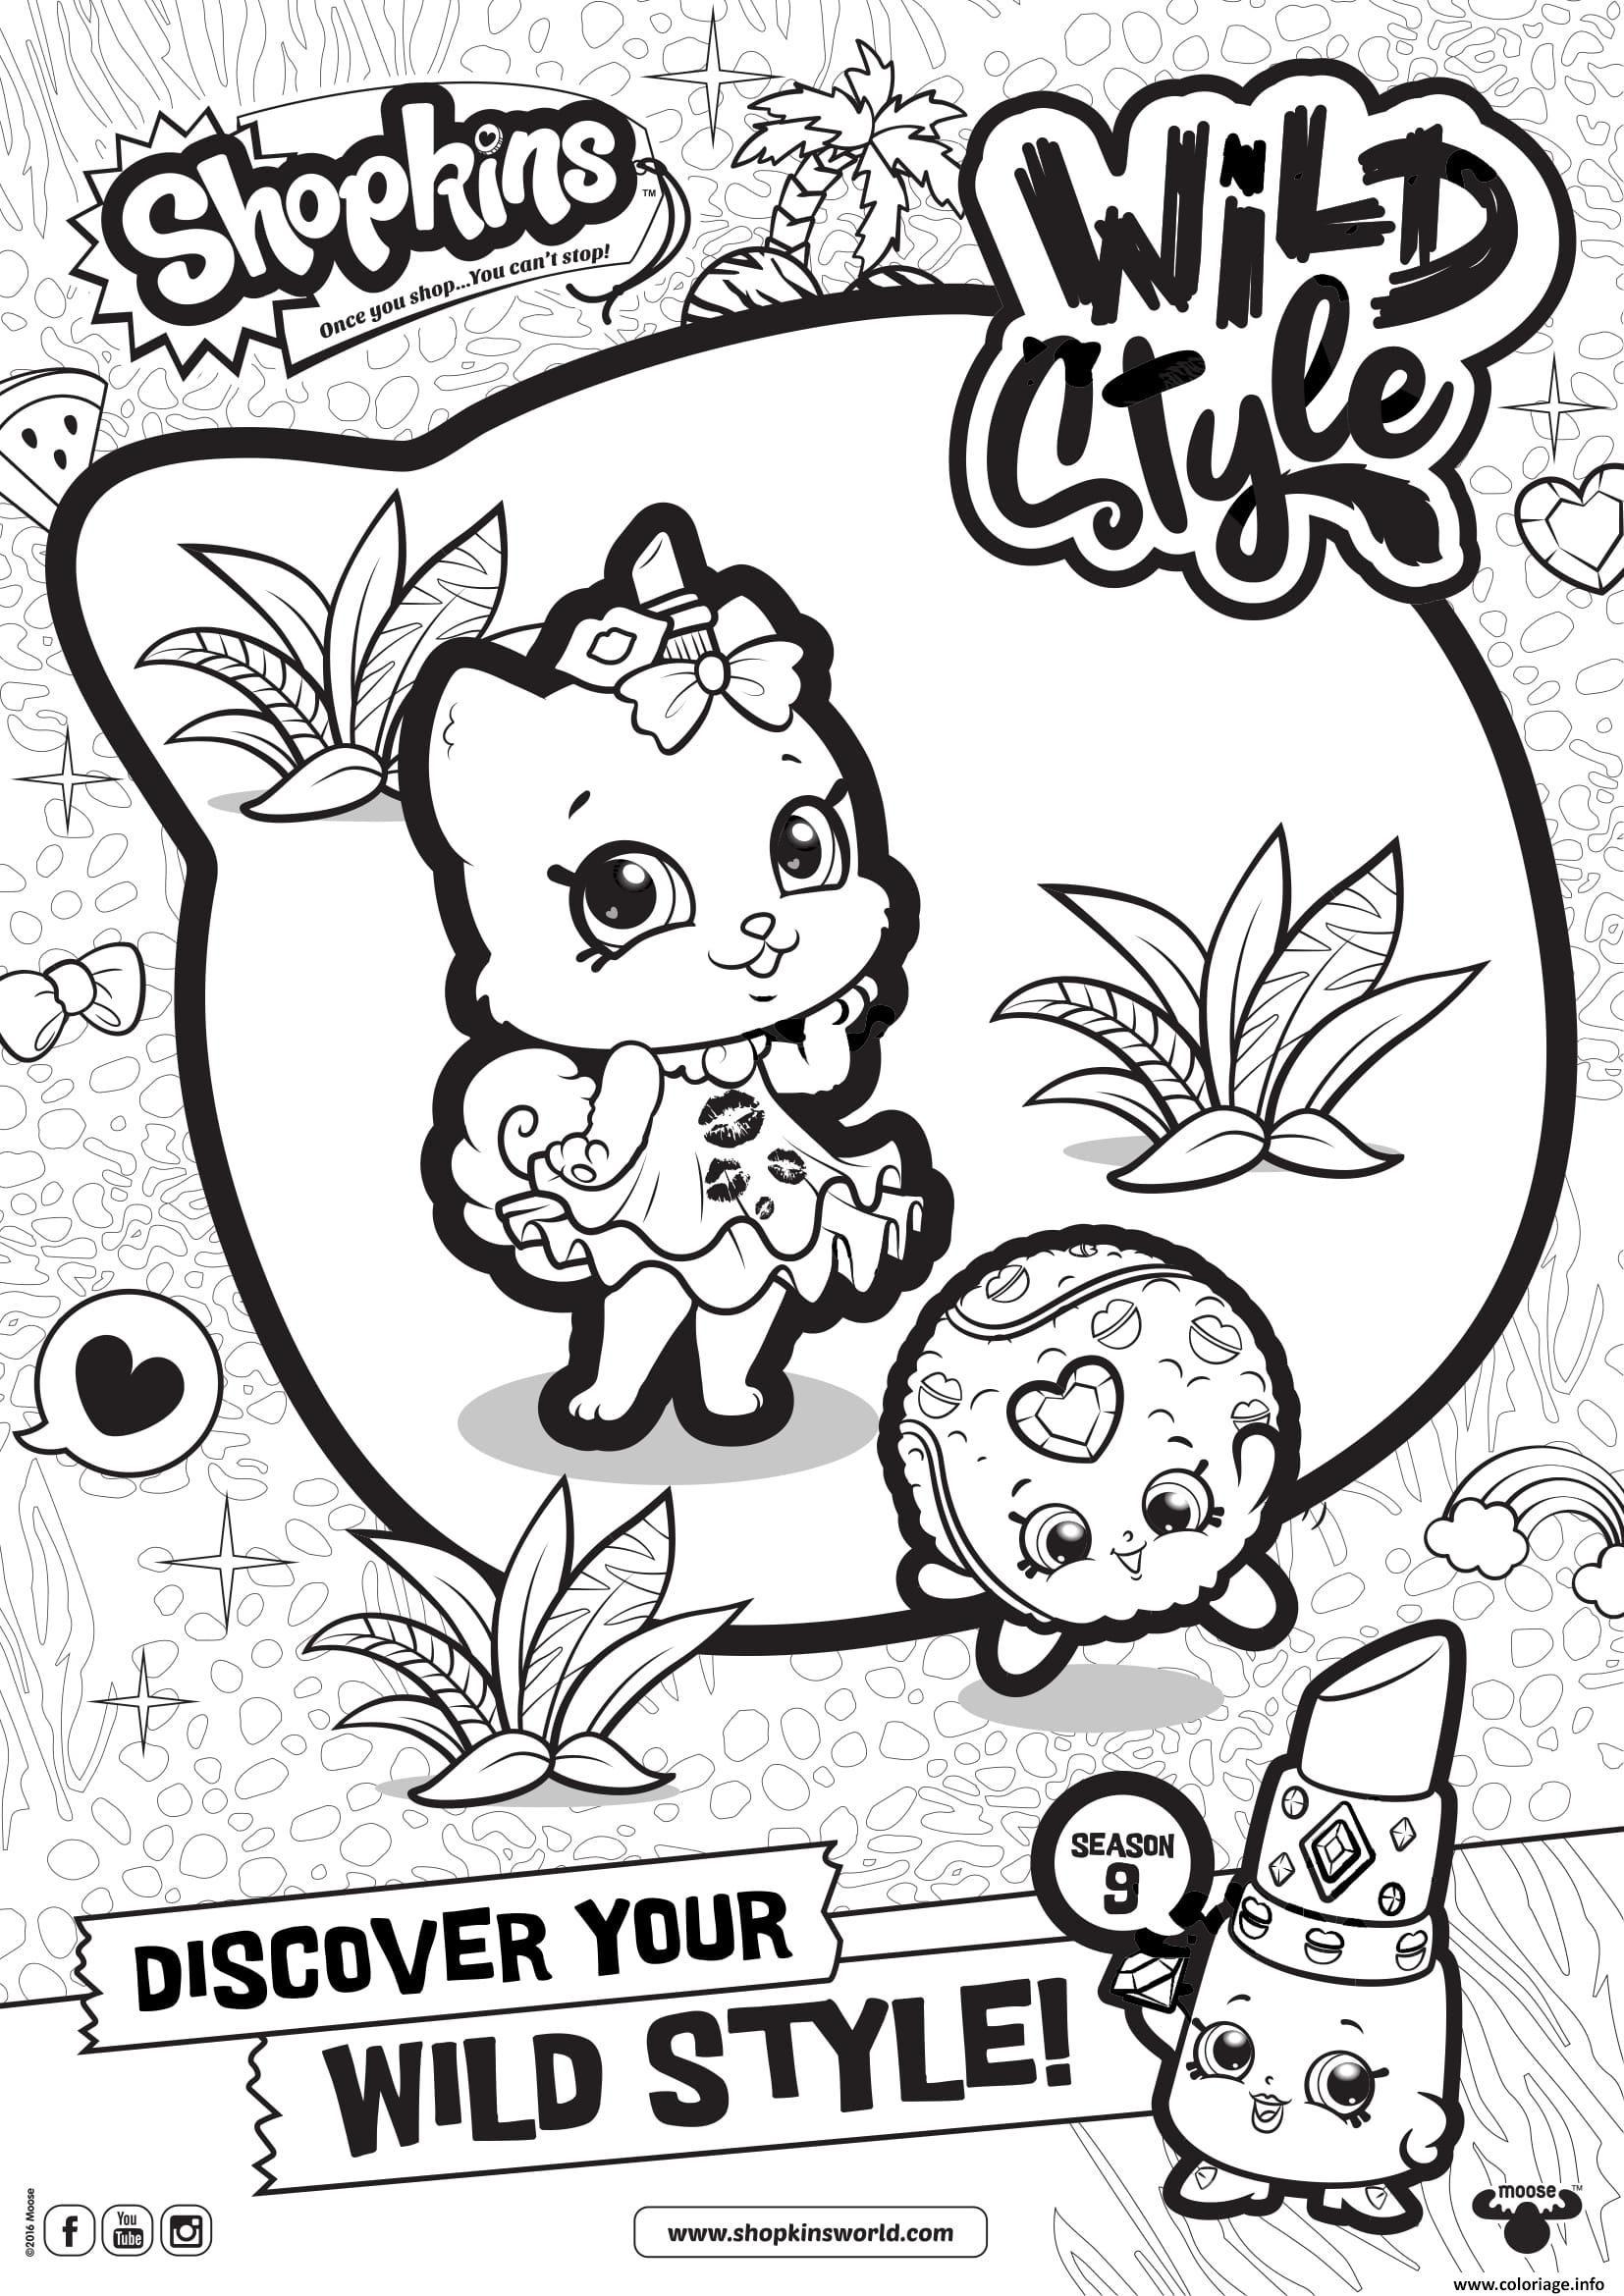 Coloriage Shopkins Saison 9 Wild Style 3 Dessin A Imprimer